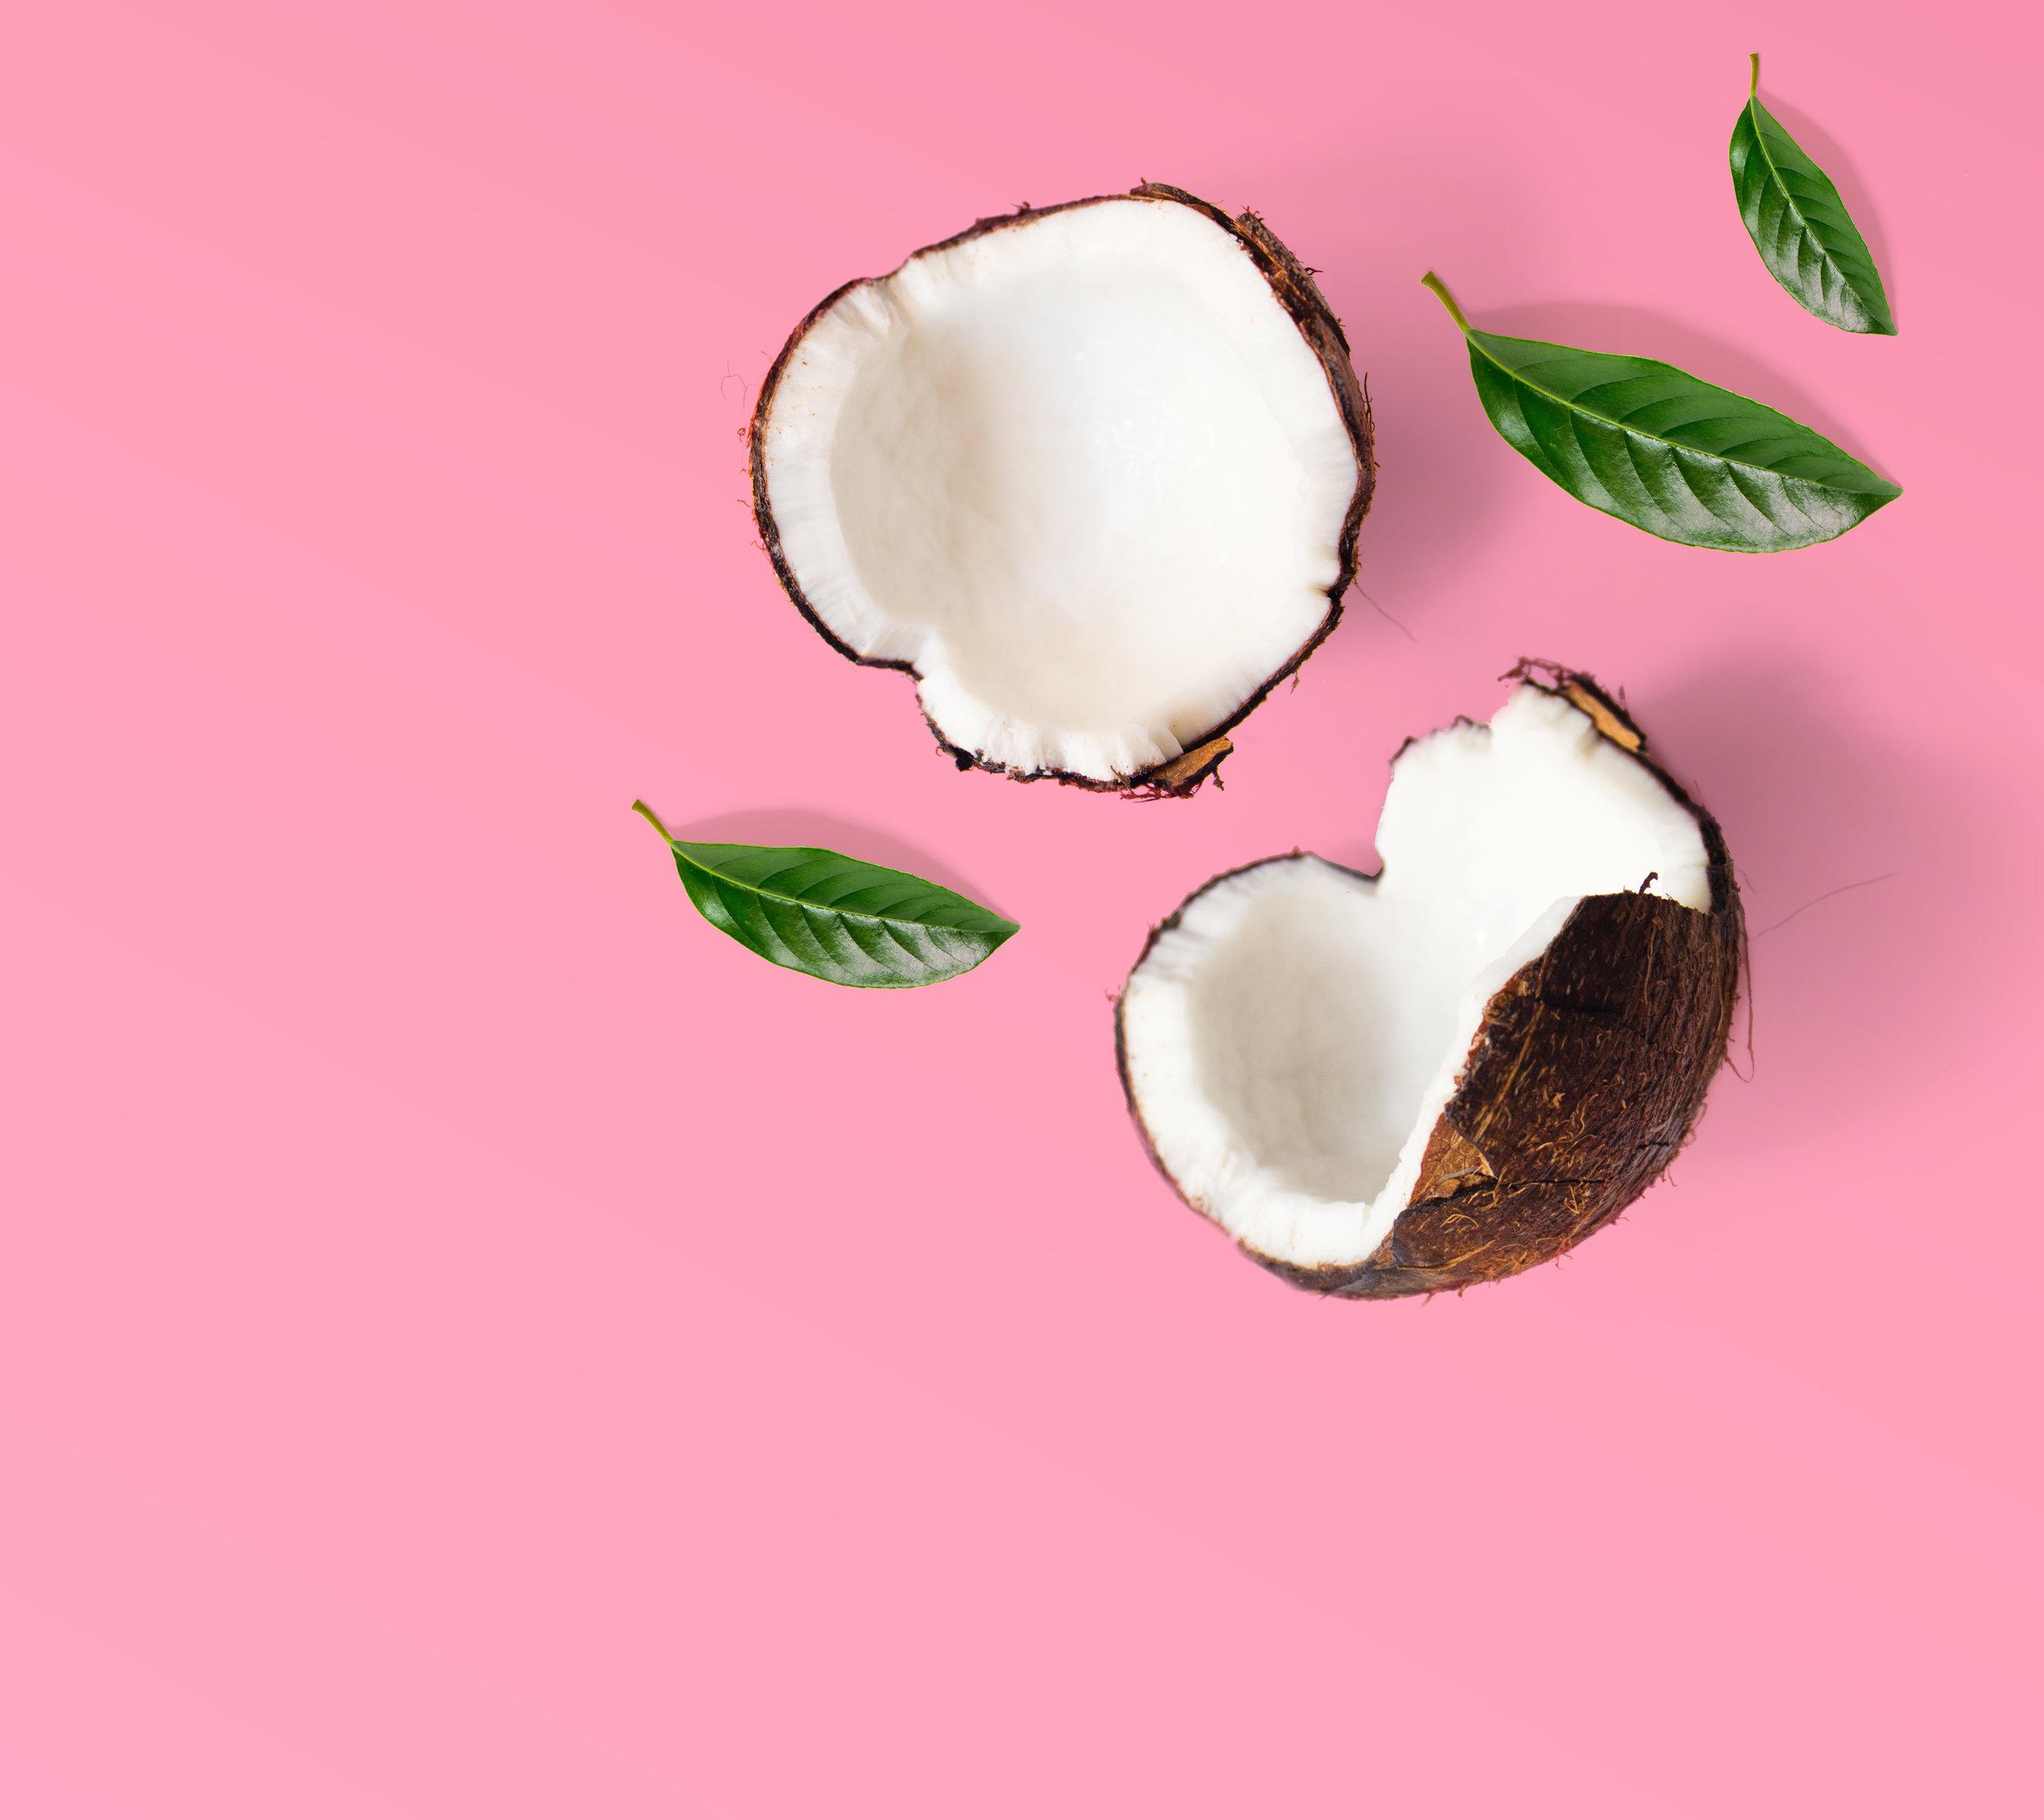 coconut_on_pink.jpg